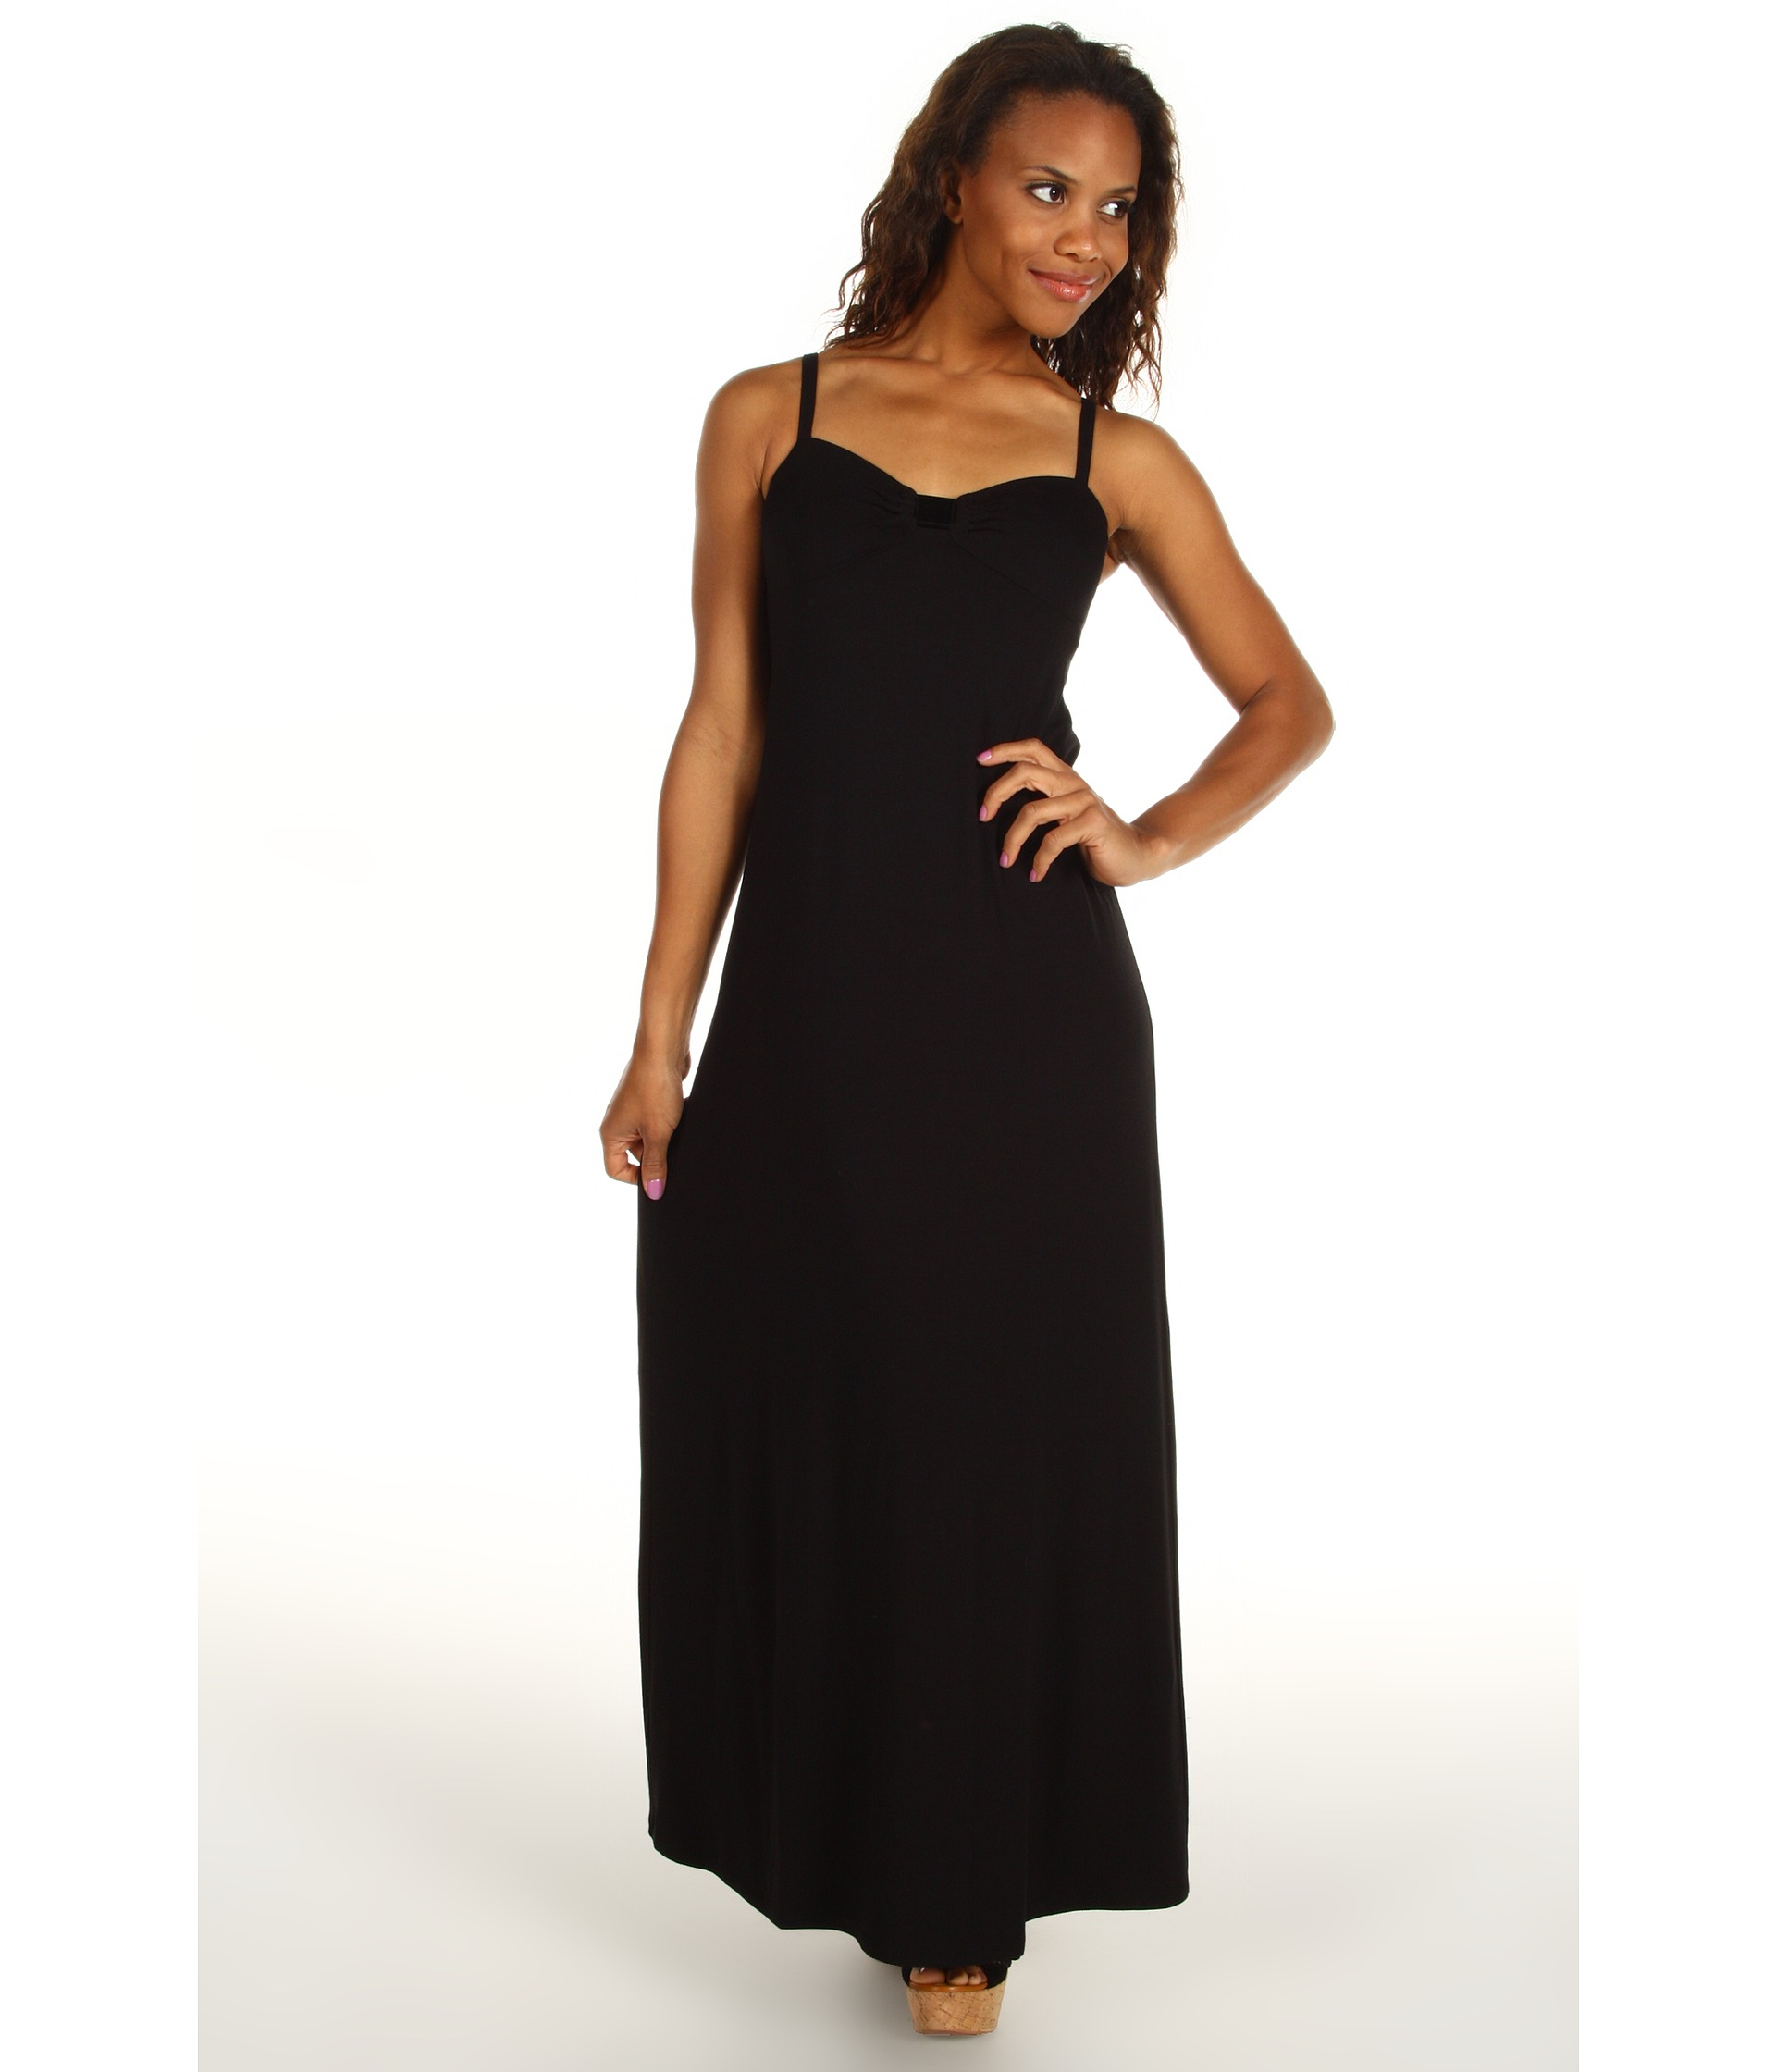 Tommy Bahama Tambour Classic Long Dress $94.99 $158.00